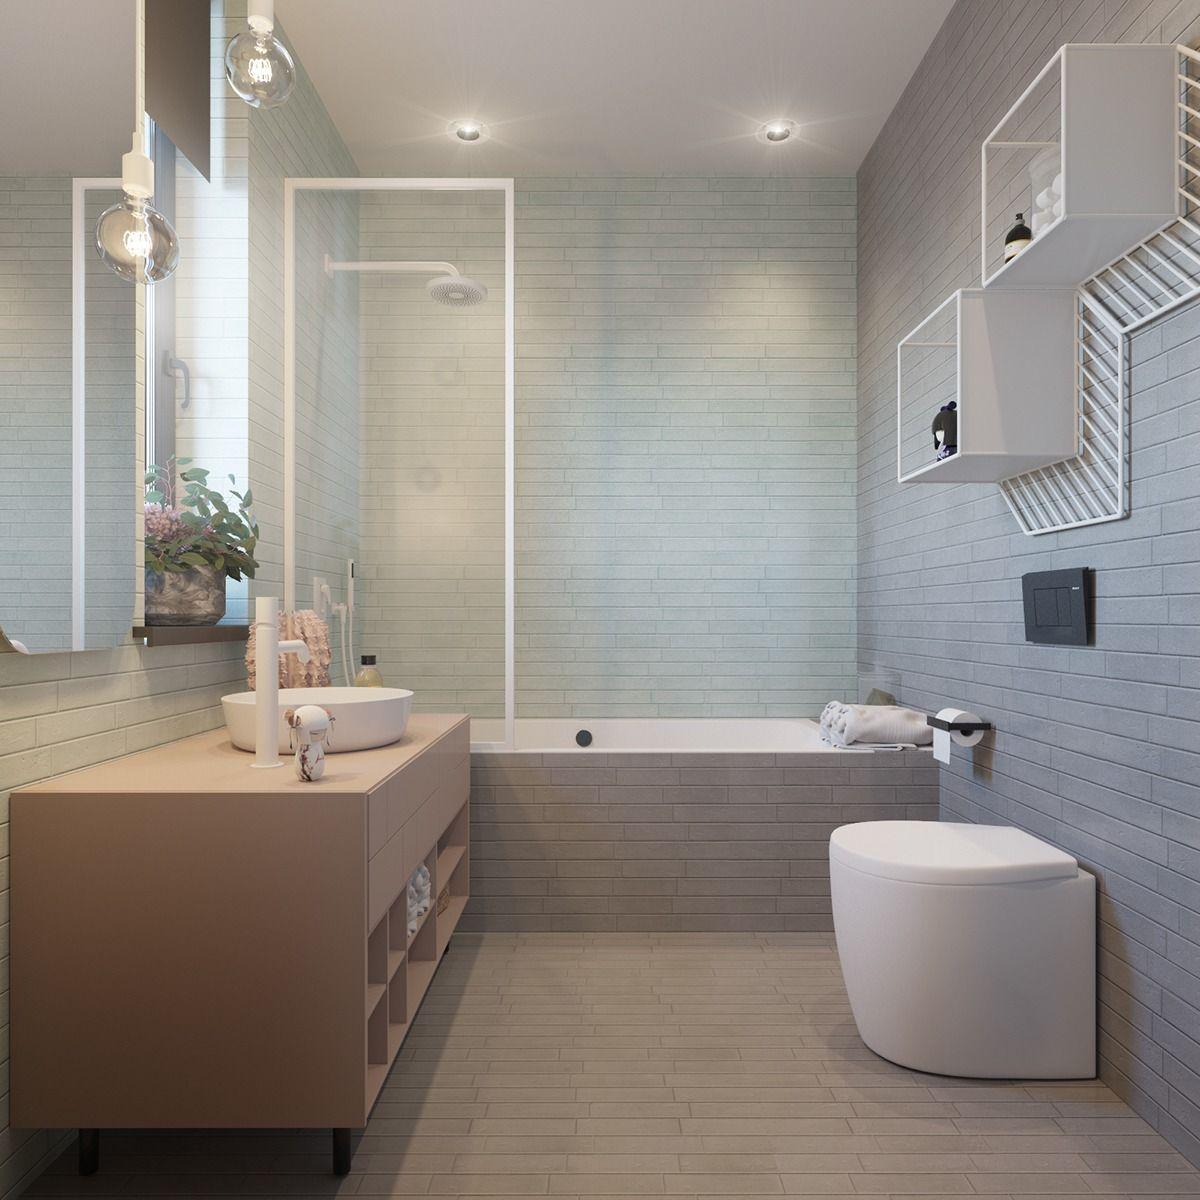 Super Stylish Kids Room Designs Minimalist Bathroom Design Best Bathroom Designs Cool Apartments